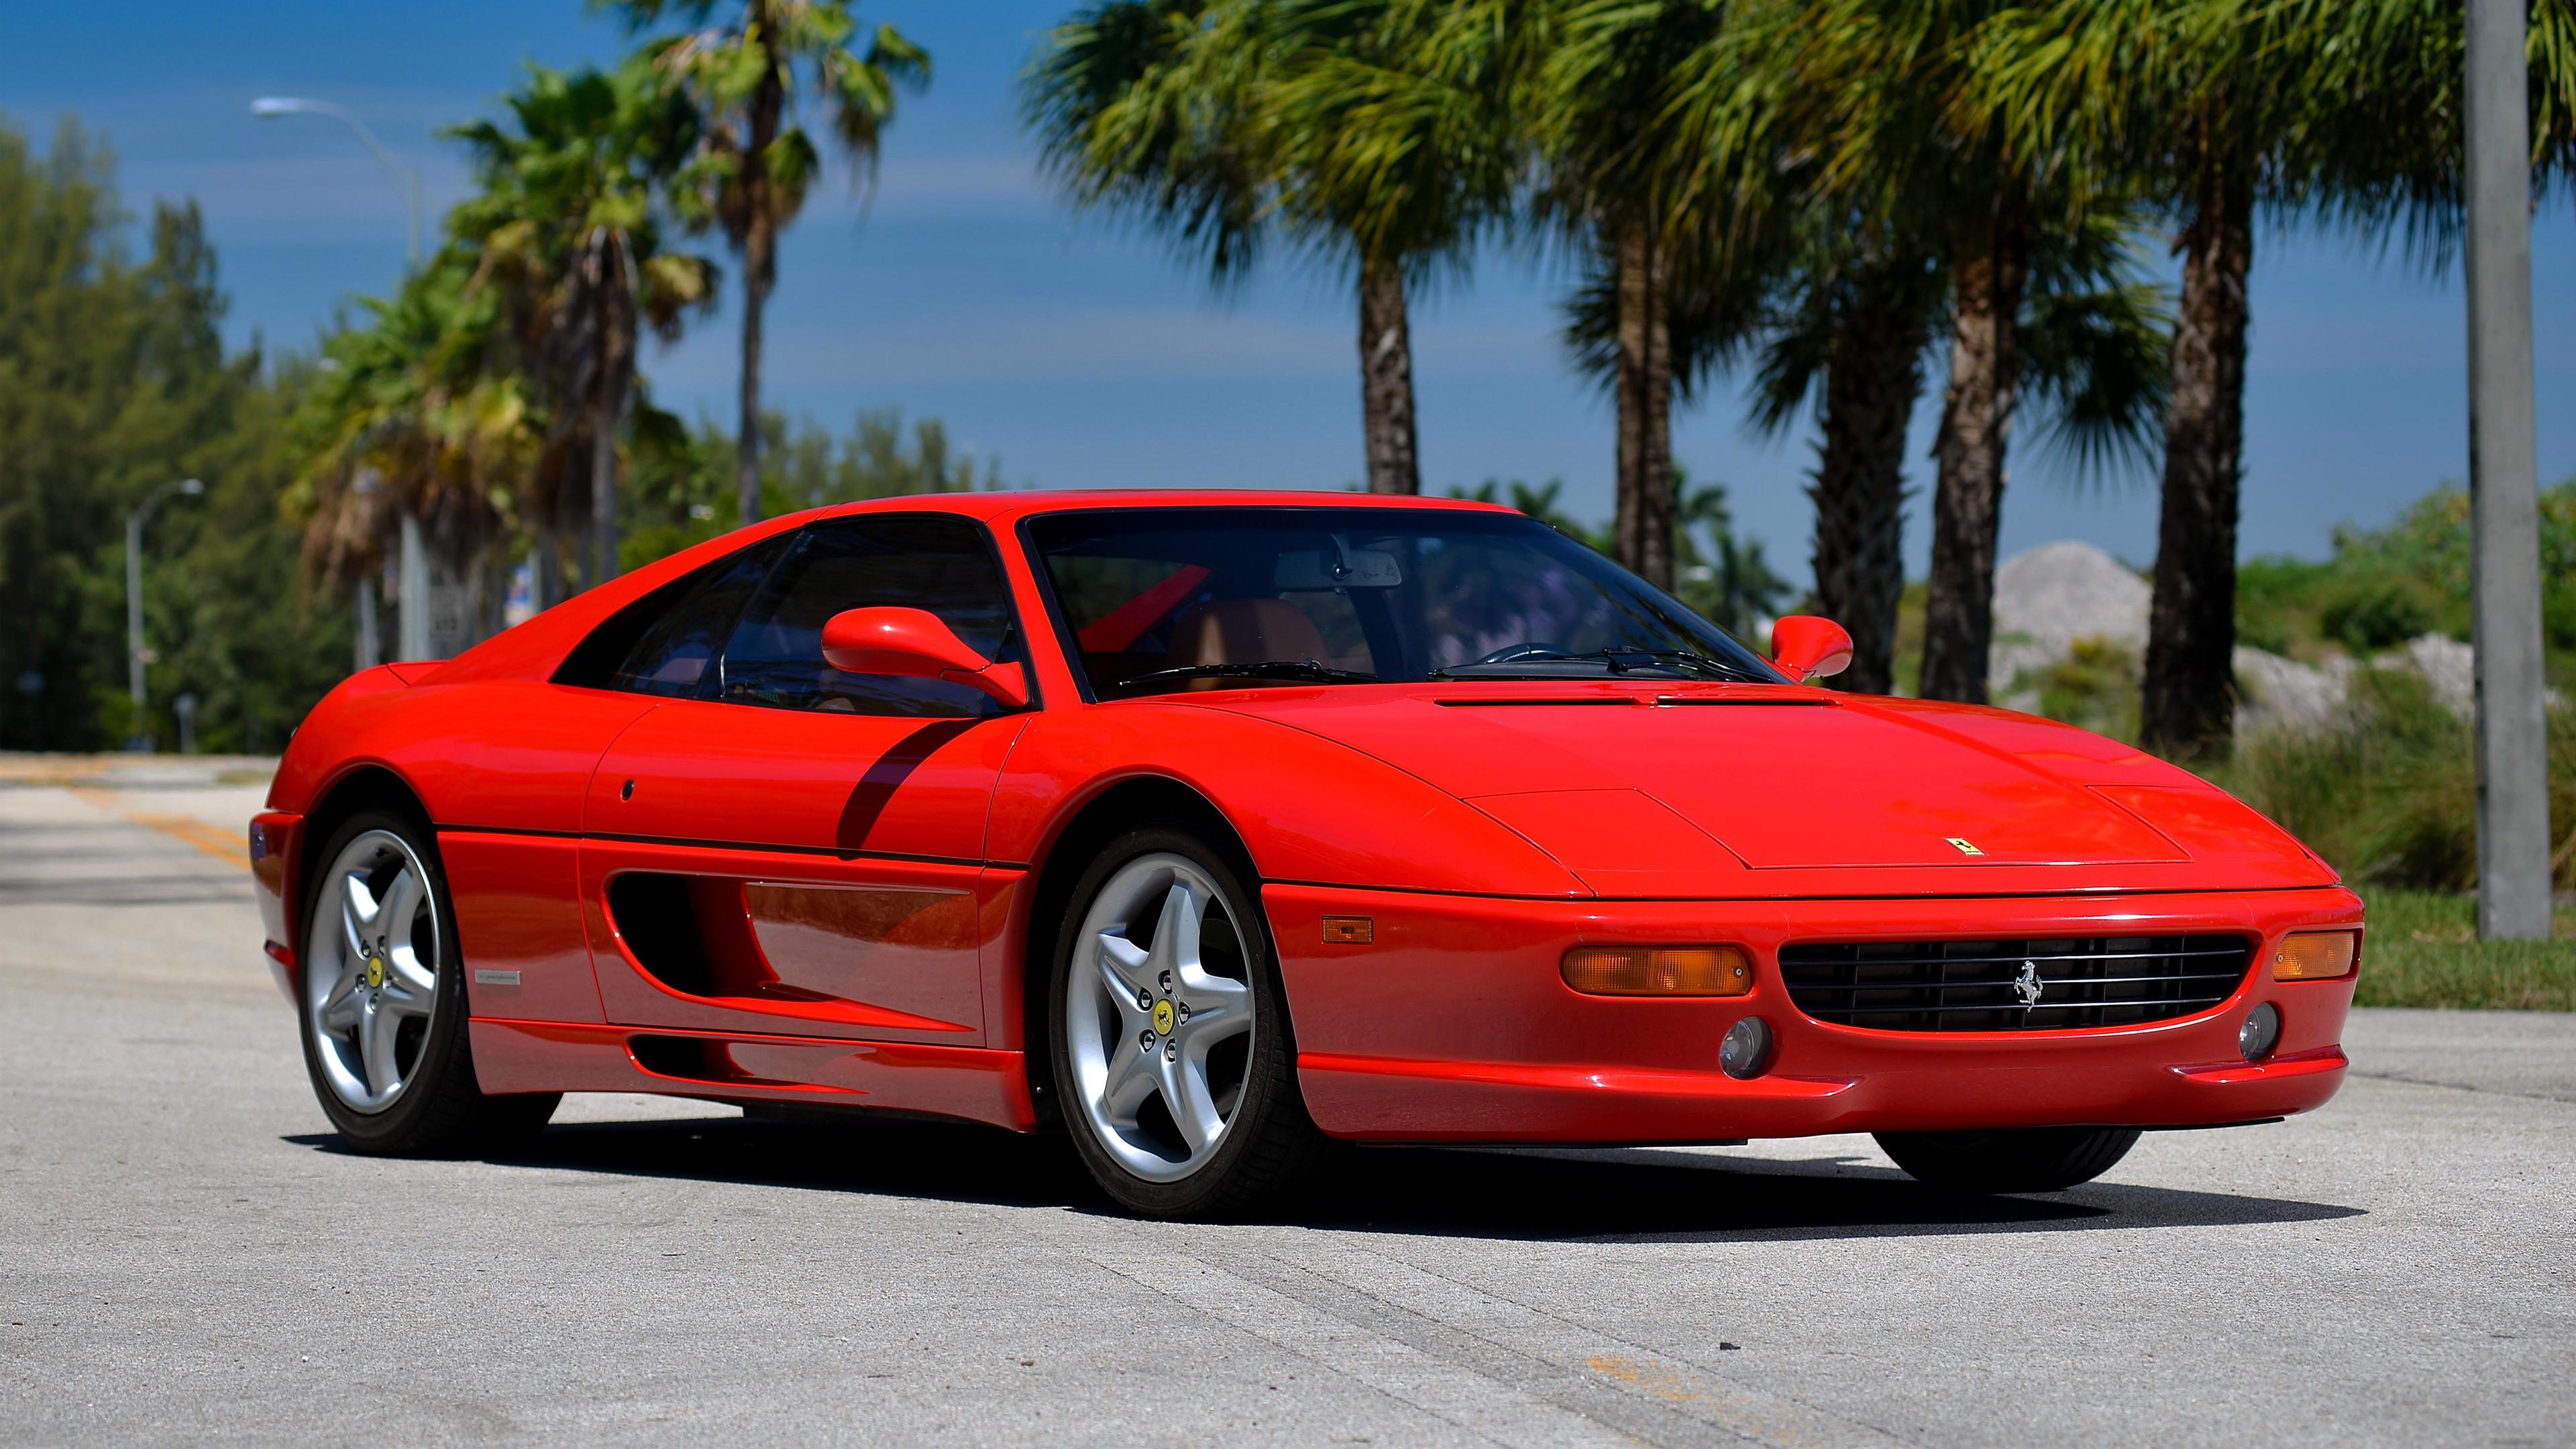 Acura Exotic Car >> Ferrari F355 GTS 4K Wallpaper   HD Car Wallpapers   ID #6903